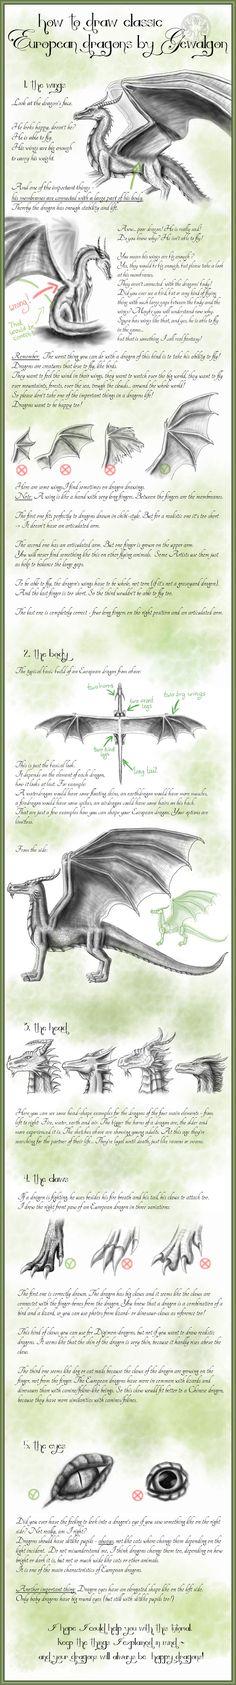 How to draw Classic European Dragons by Gewalgon by Gewalgon on DeviantArt